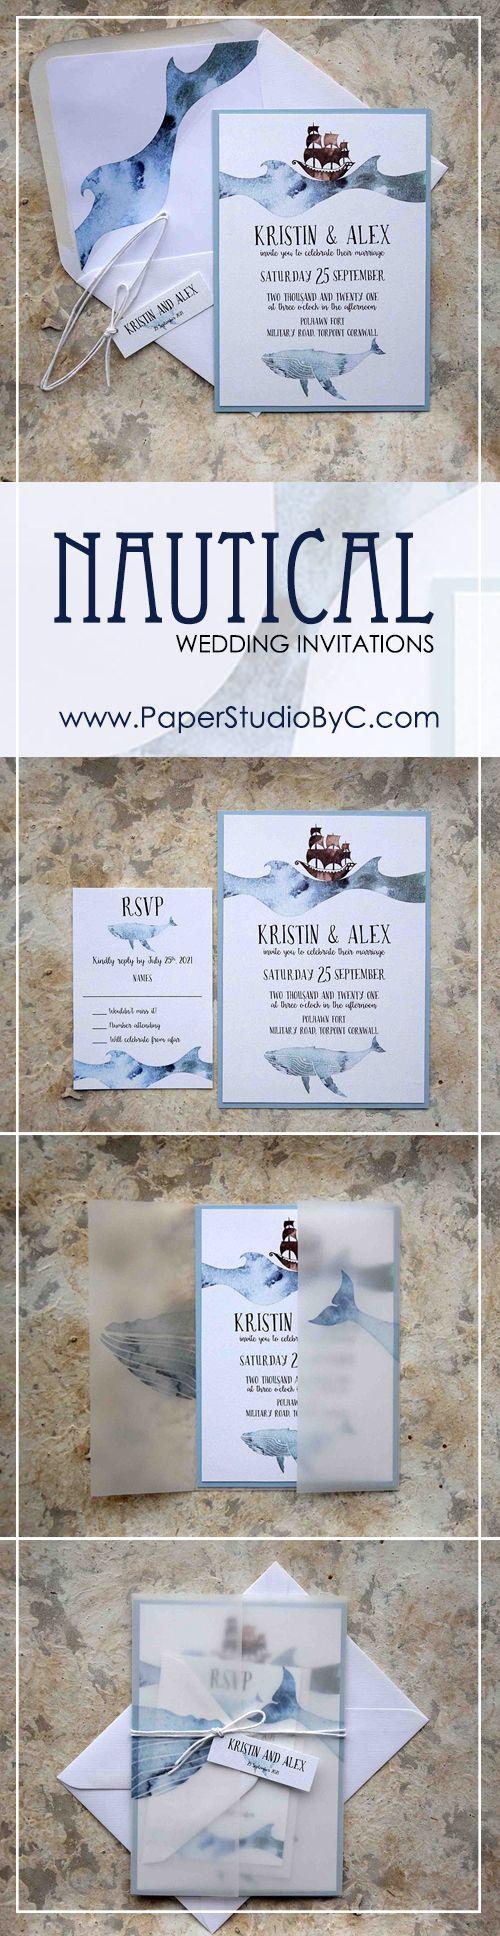 28 Best Beach Wedding Invitations Images On Pinterest Beach